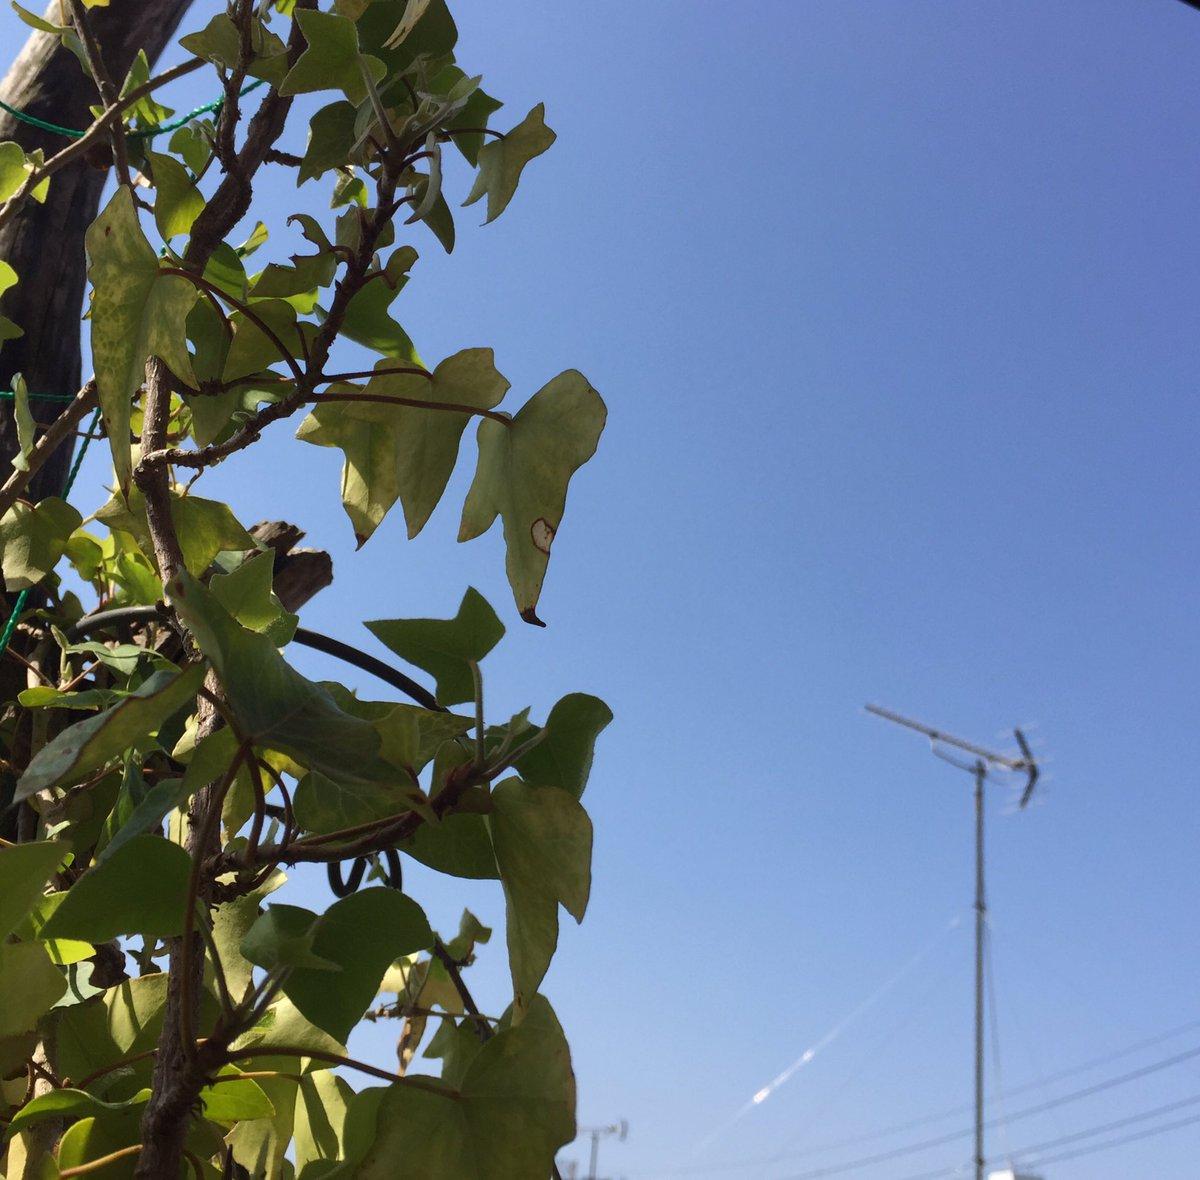 Tokyo  ☀️☀️☀️THU☀️☀️☀️  気温 15℃      湿度 39%  #イマソラ #sky #Flower #蕾 #光  花と景色眺め💐  #家 気持ち良い一日を🌷  #joy have a  wonderful day🌸